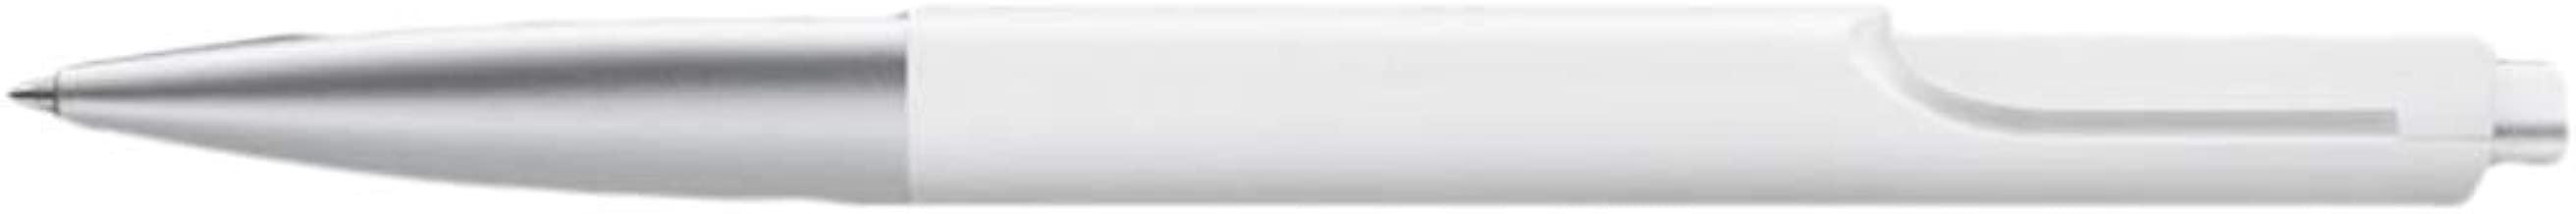 Lamy Unisex Noto Ballpoint Pen - White/Silver